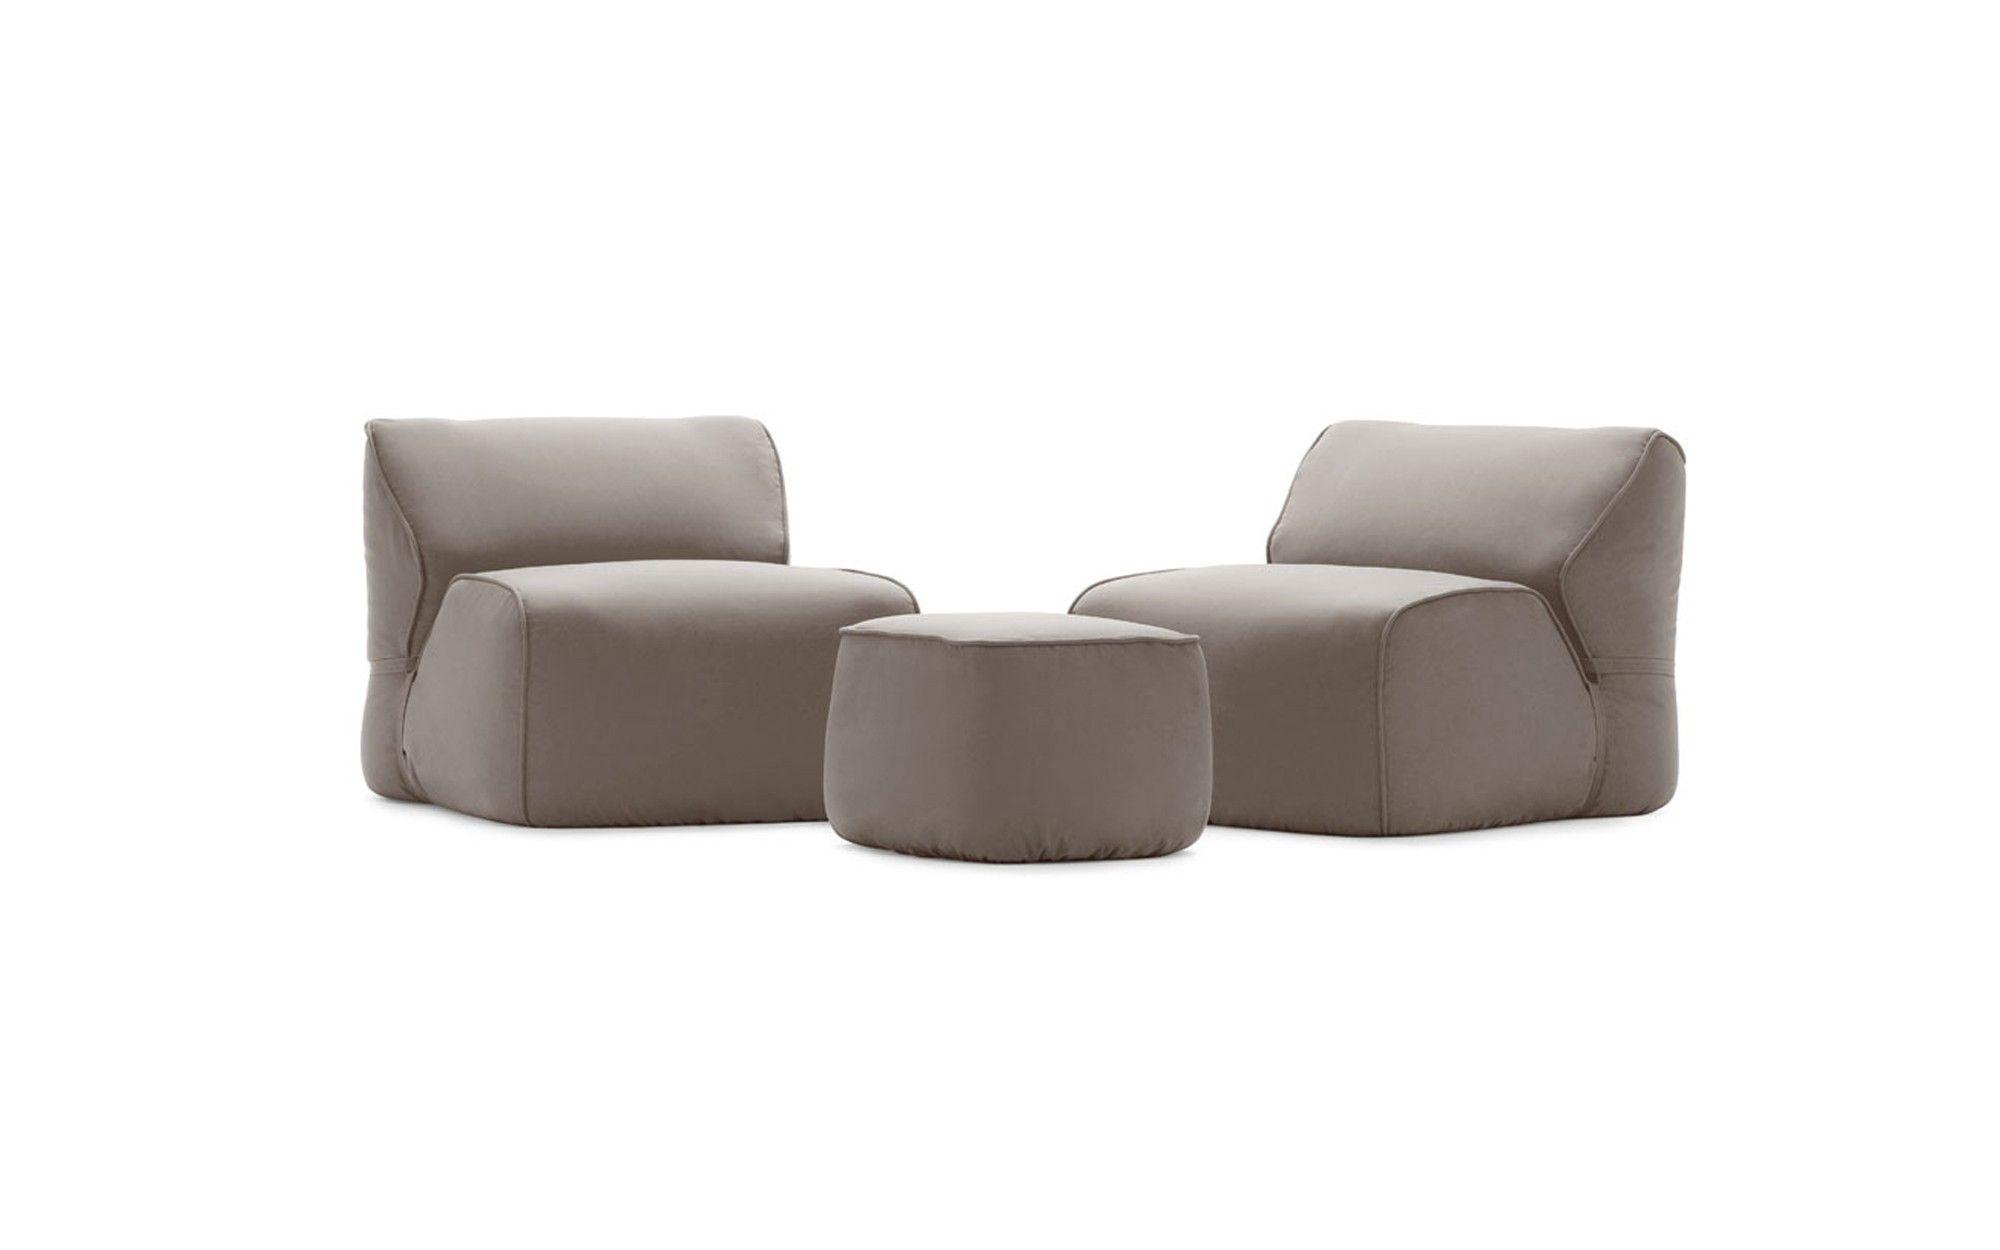 Soft Sofa European Design and Interior Architecture